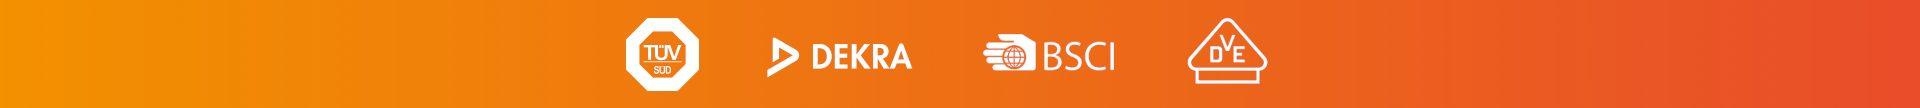 Dekra Tüv BSCI Logo